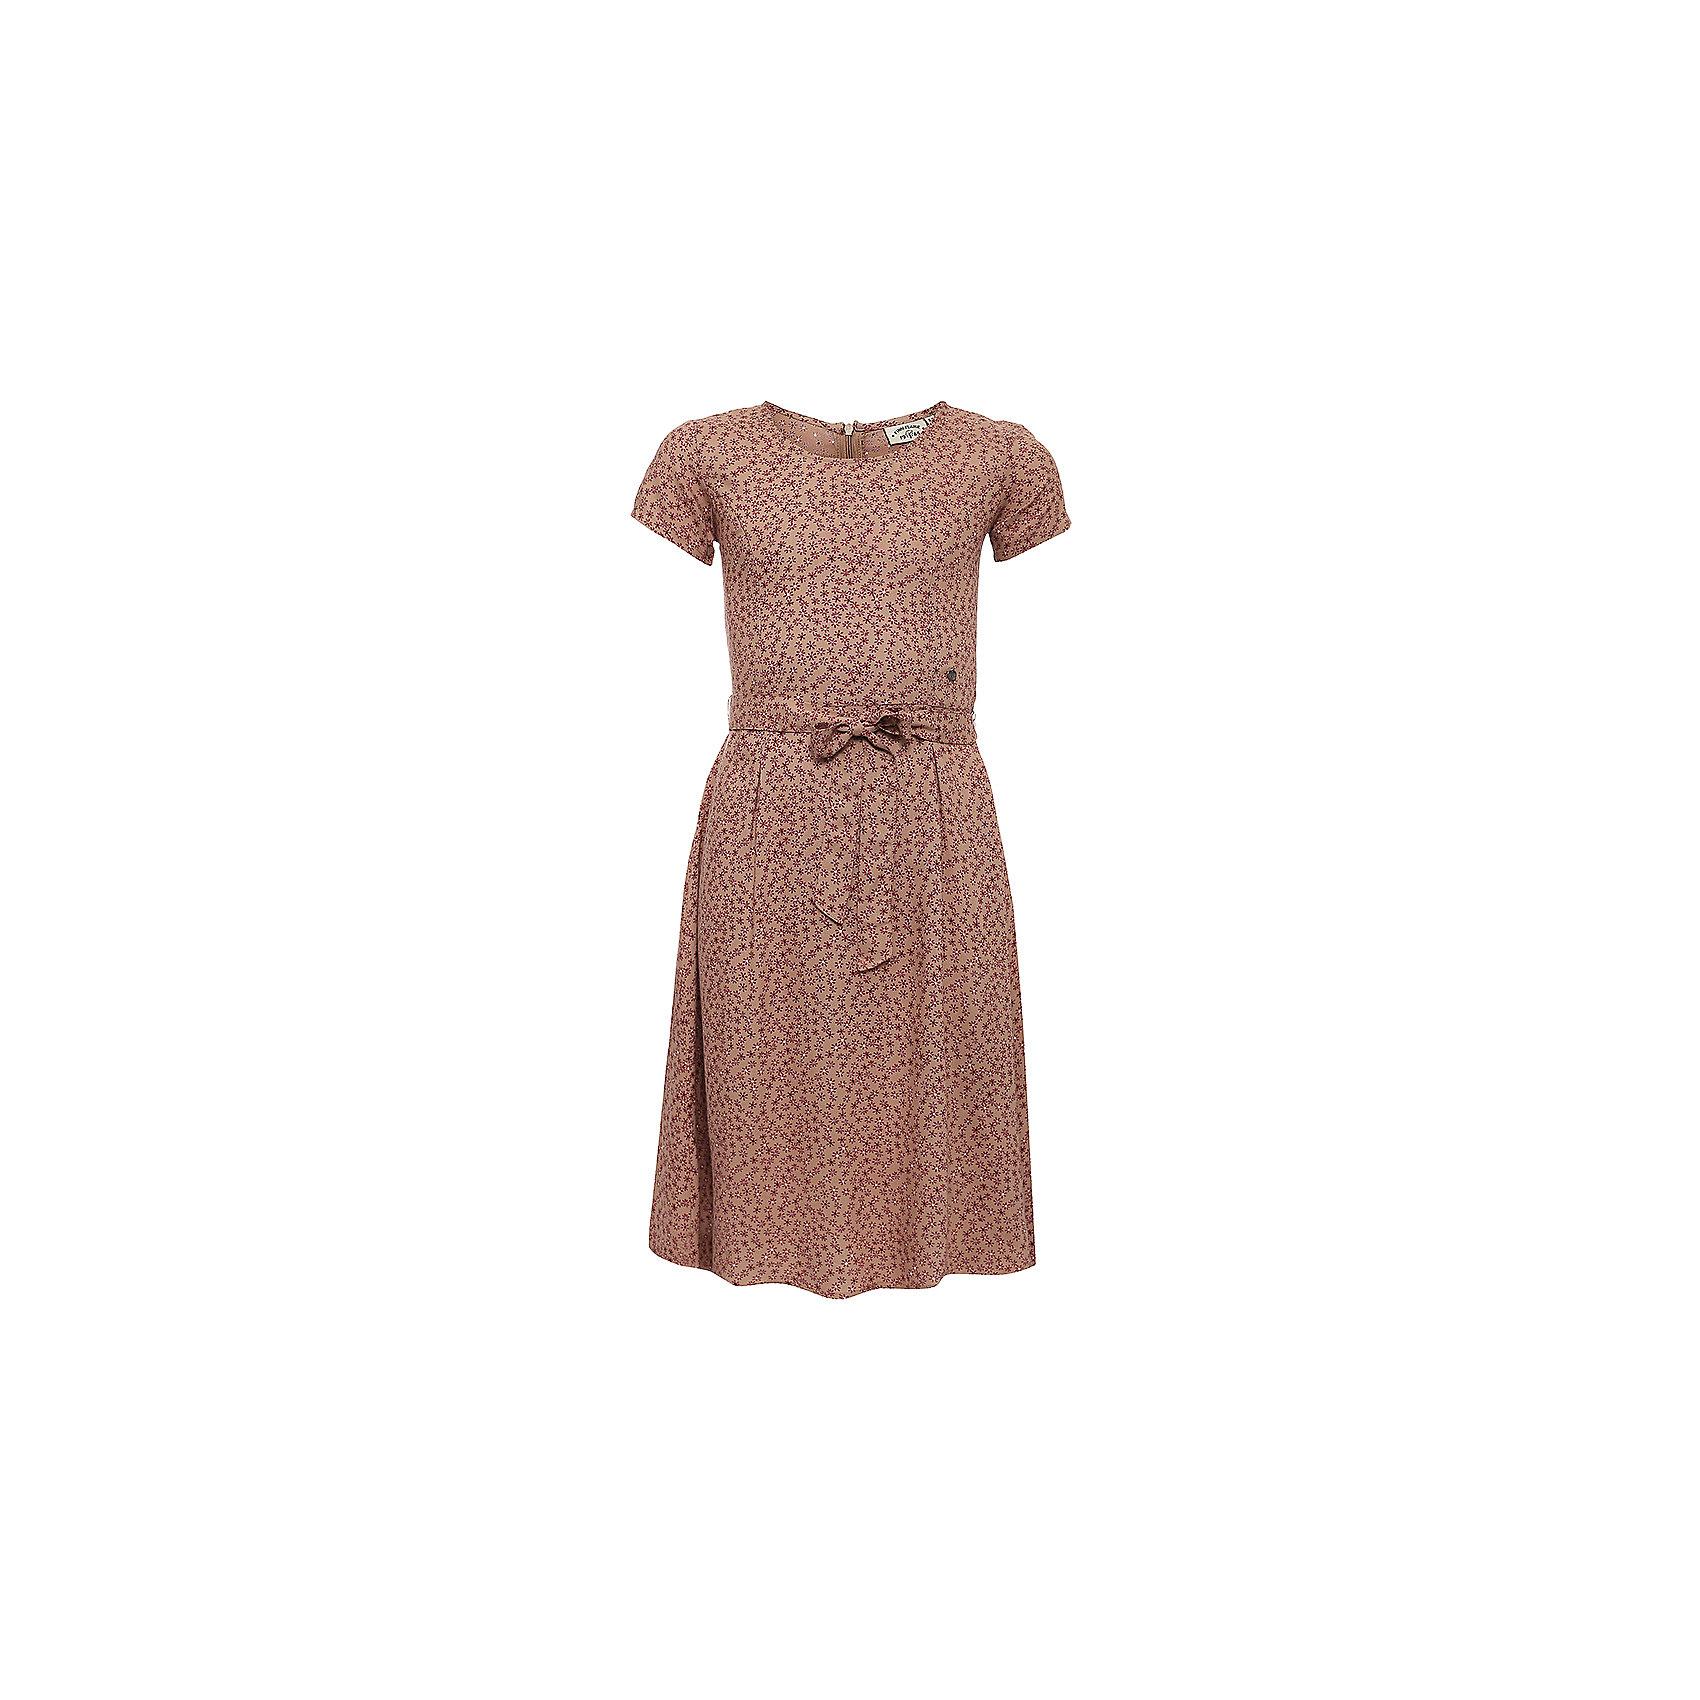 Платье для девочки Finn FlareПлатье для девочки от известного бренда Finn Flare<br>Фактура материала:Текстильный<br>Вид застежки:Молния<br> Длина рукава:Короткие<br> Тип карманов:Без карманов<br>Состав:<br>100% вискоза<br><br>Ширина мм: 236<br>Глубина мм: 16<br>Высота мм: 184<br>Вес г: 177<br>Цвет: коричневый<br>Возраст от месяцев: 72<br>Возраст до месяцев: 84<br>Пол: Женский<br>Возраст: Детский<br>Размер: 122,134,146,158,110<br>SKU: 4835245